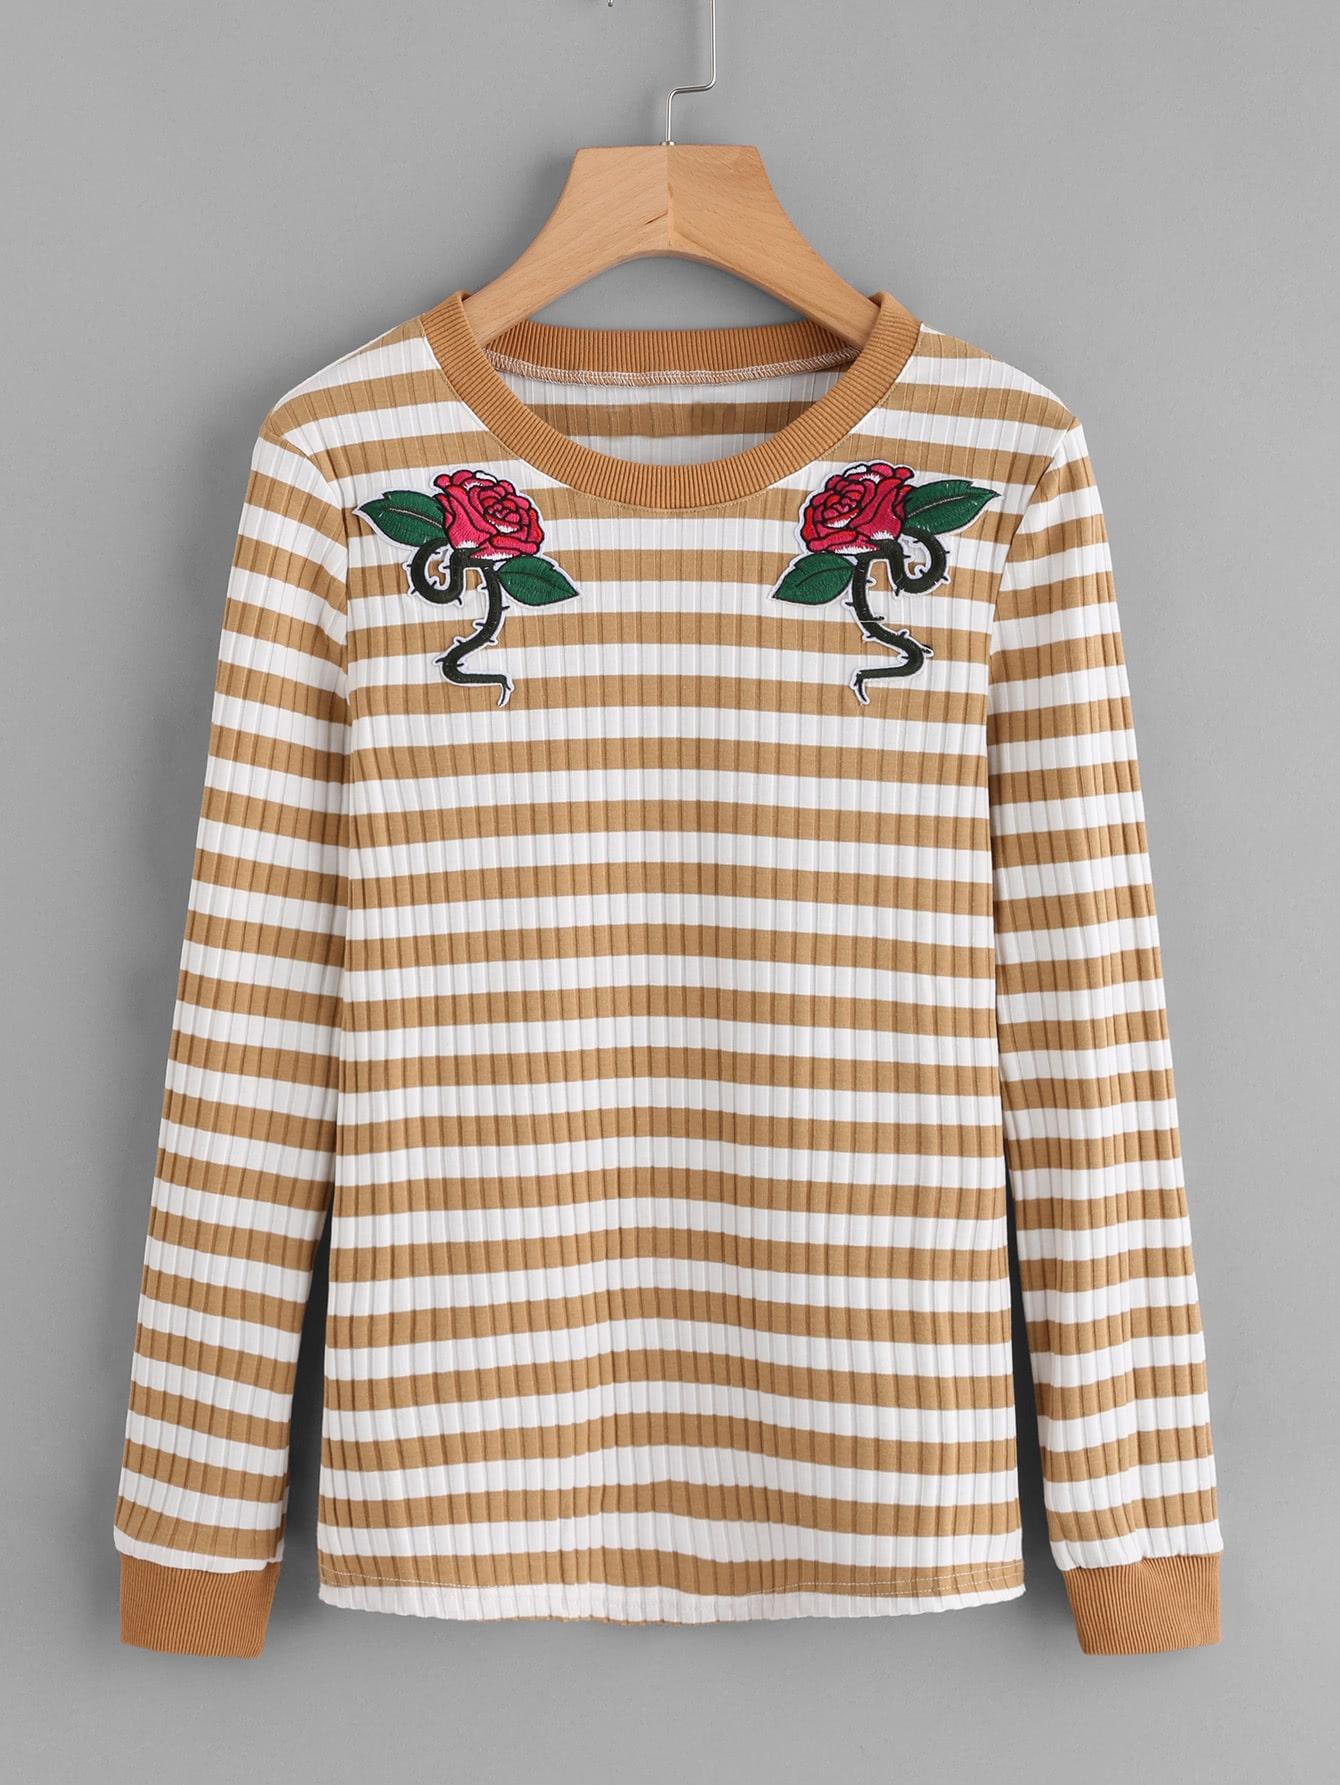 Patch Detail Rib Knit Striped Tee tee171009450